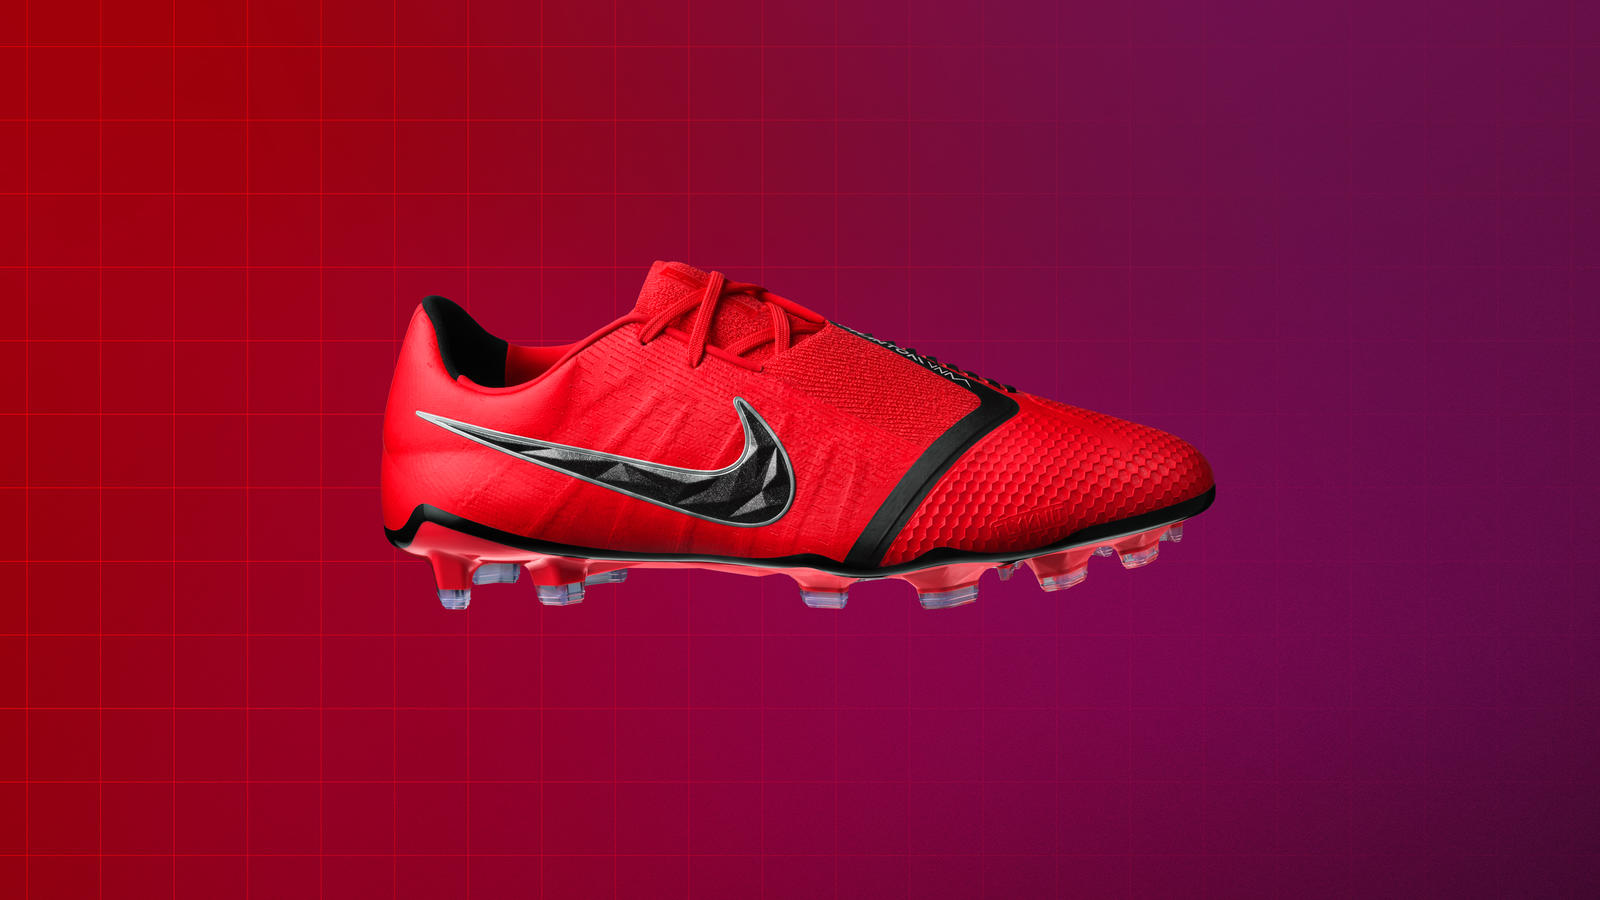 92e8856a1 Designed for Finishers - Nike s PhantomVNM Boot - FOOTBALL FASHION.ORG